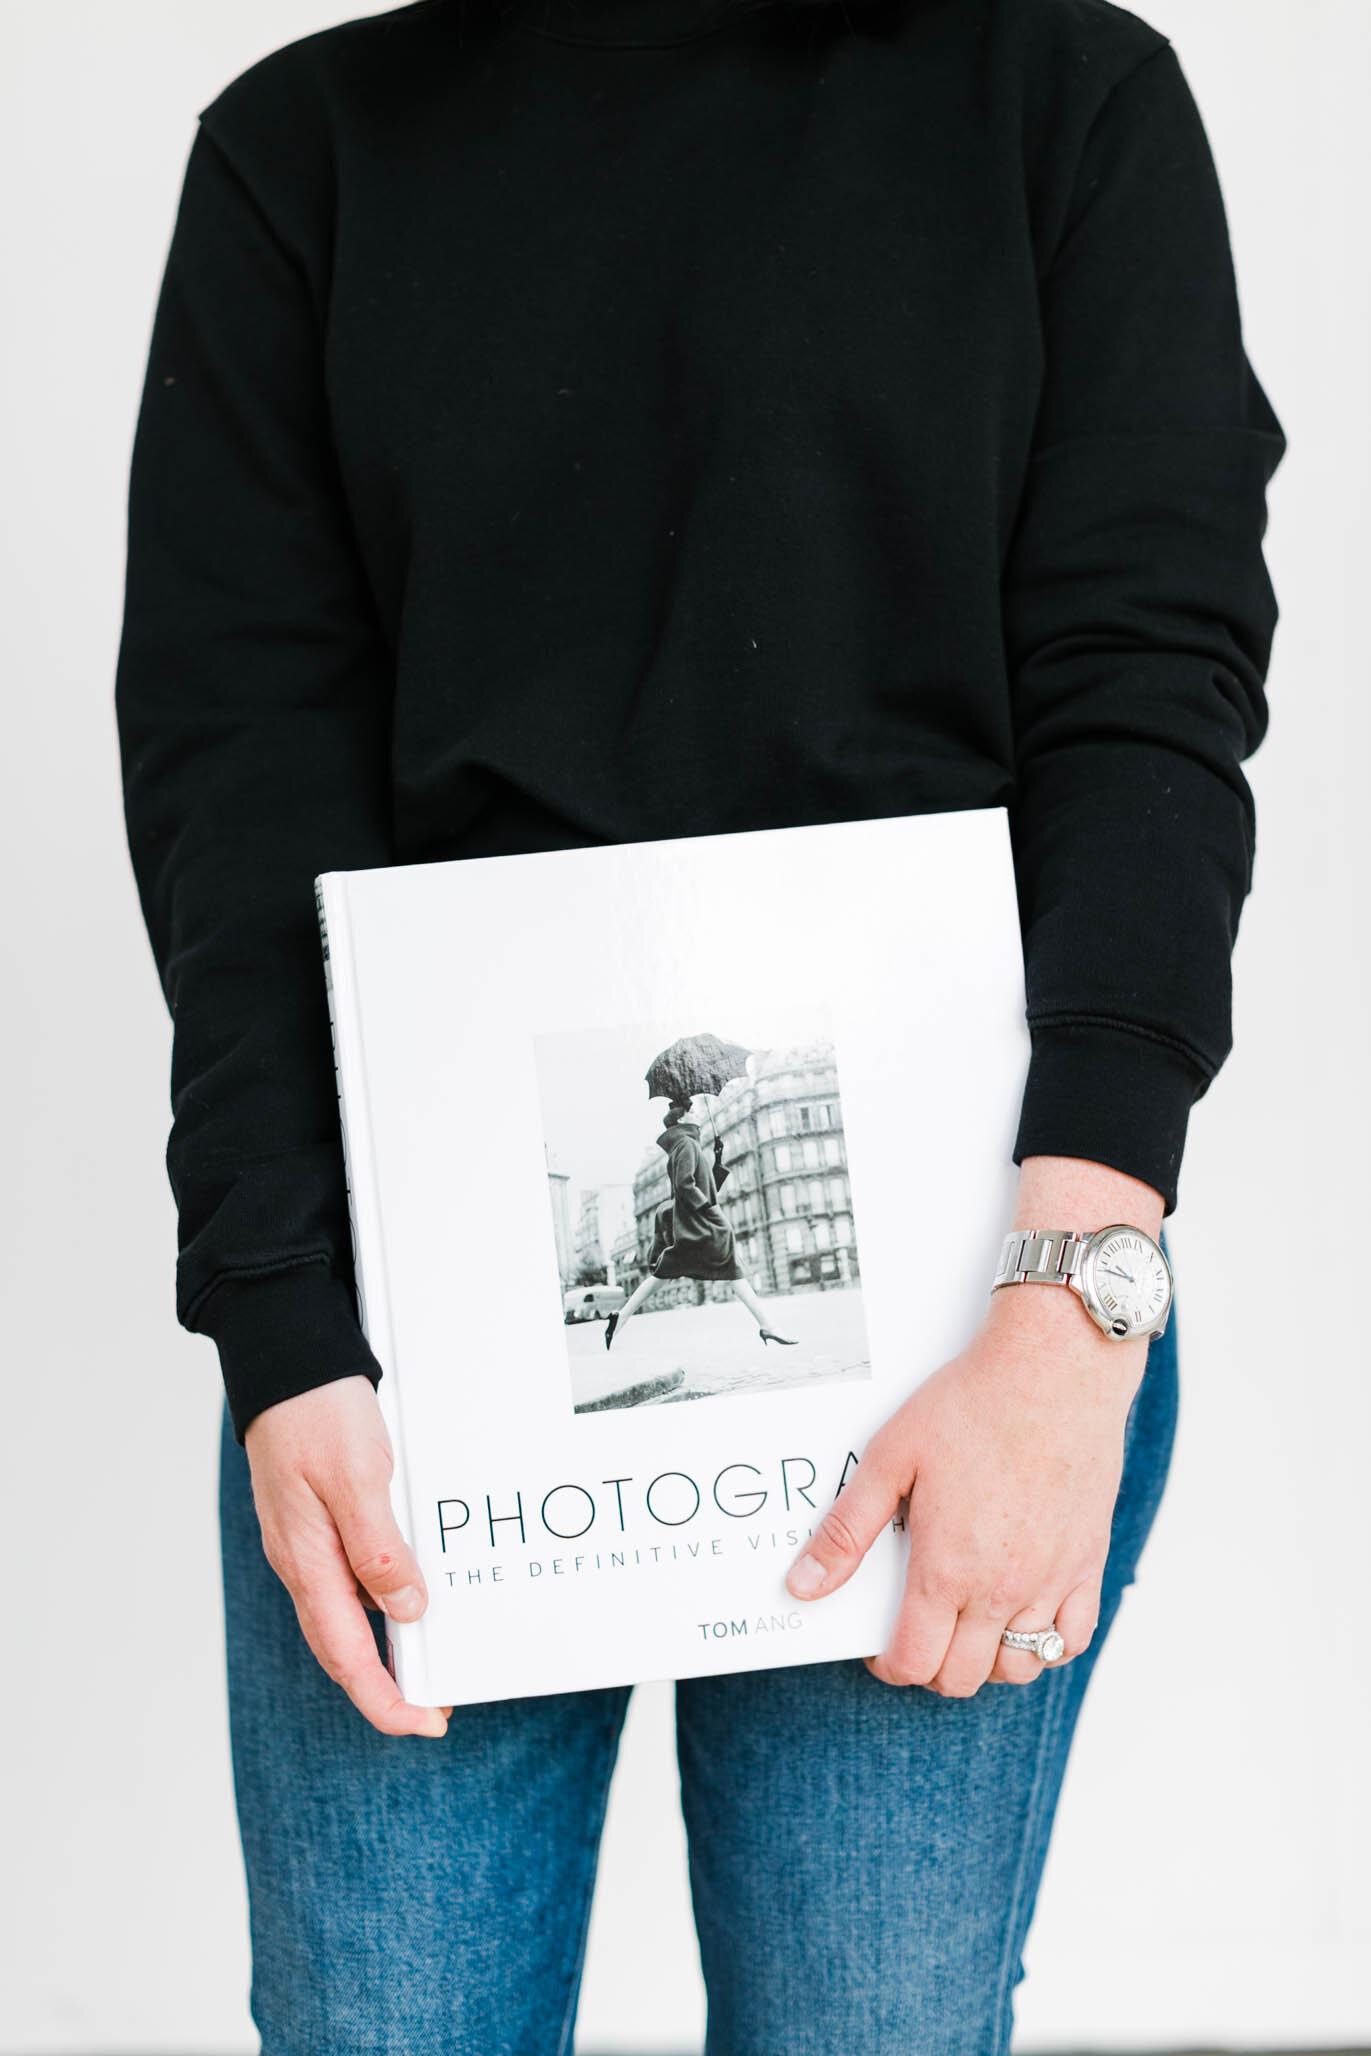 Denver Branding & Lifestyle Photographer at Denver Photo Collective